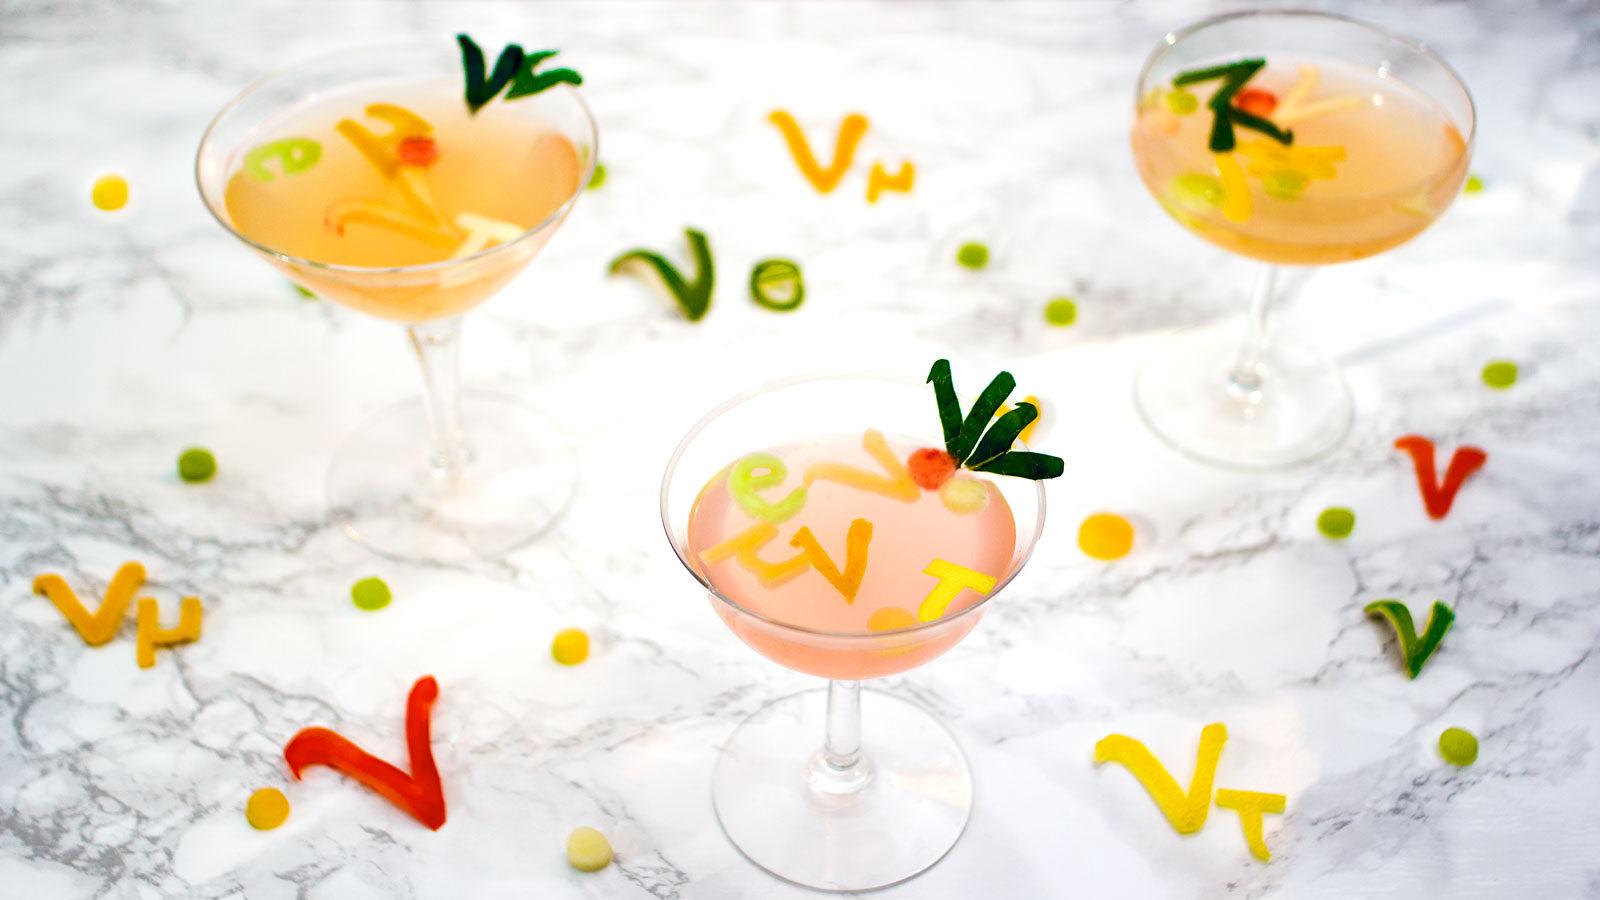 Header: The neutrino cocktail